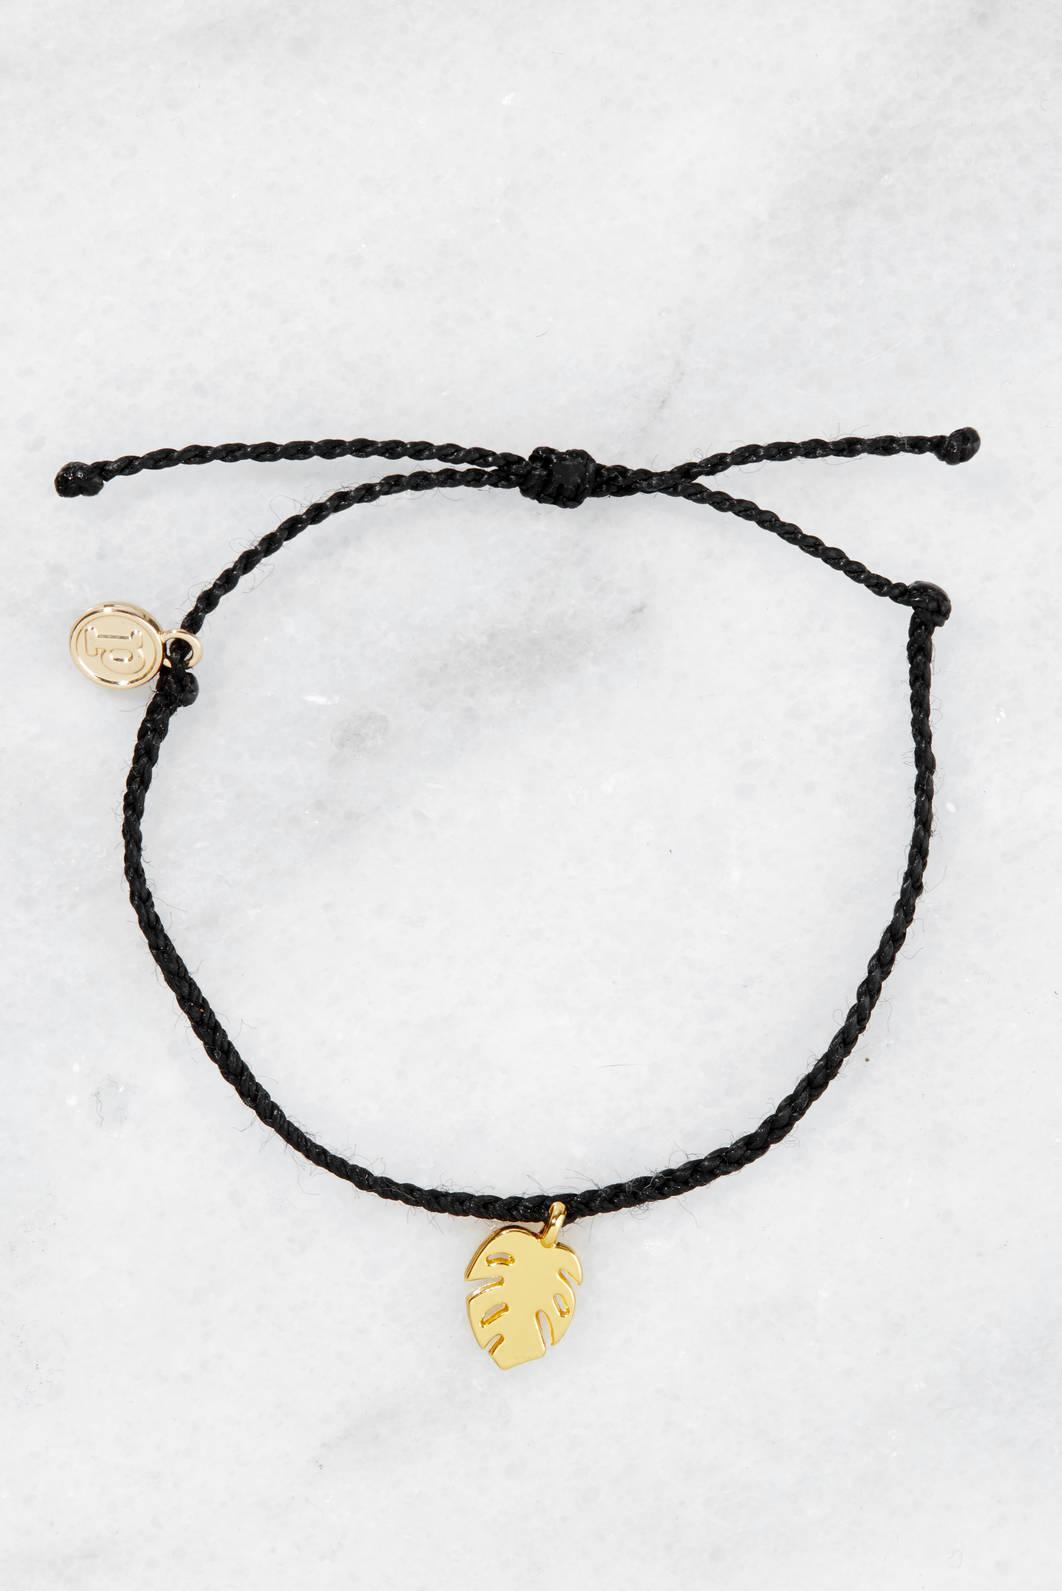 Charm Bracelet - French Swish by VIDA VIDA UisssQAL